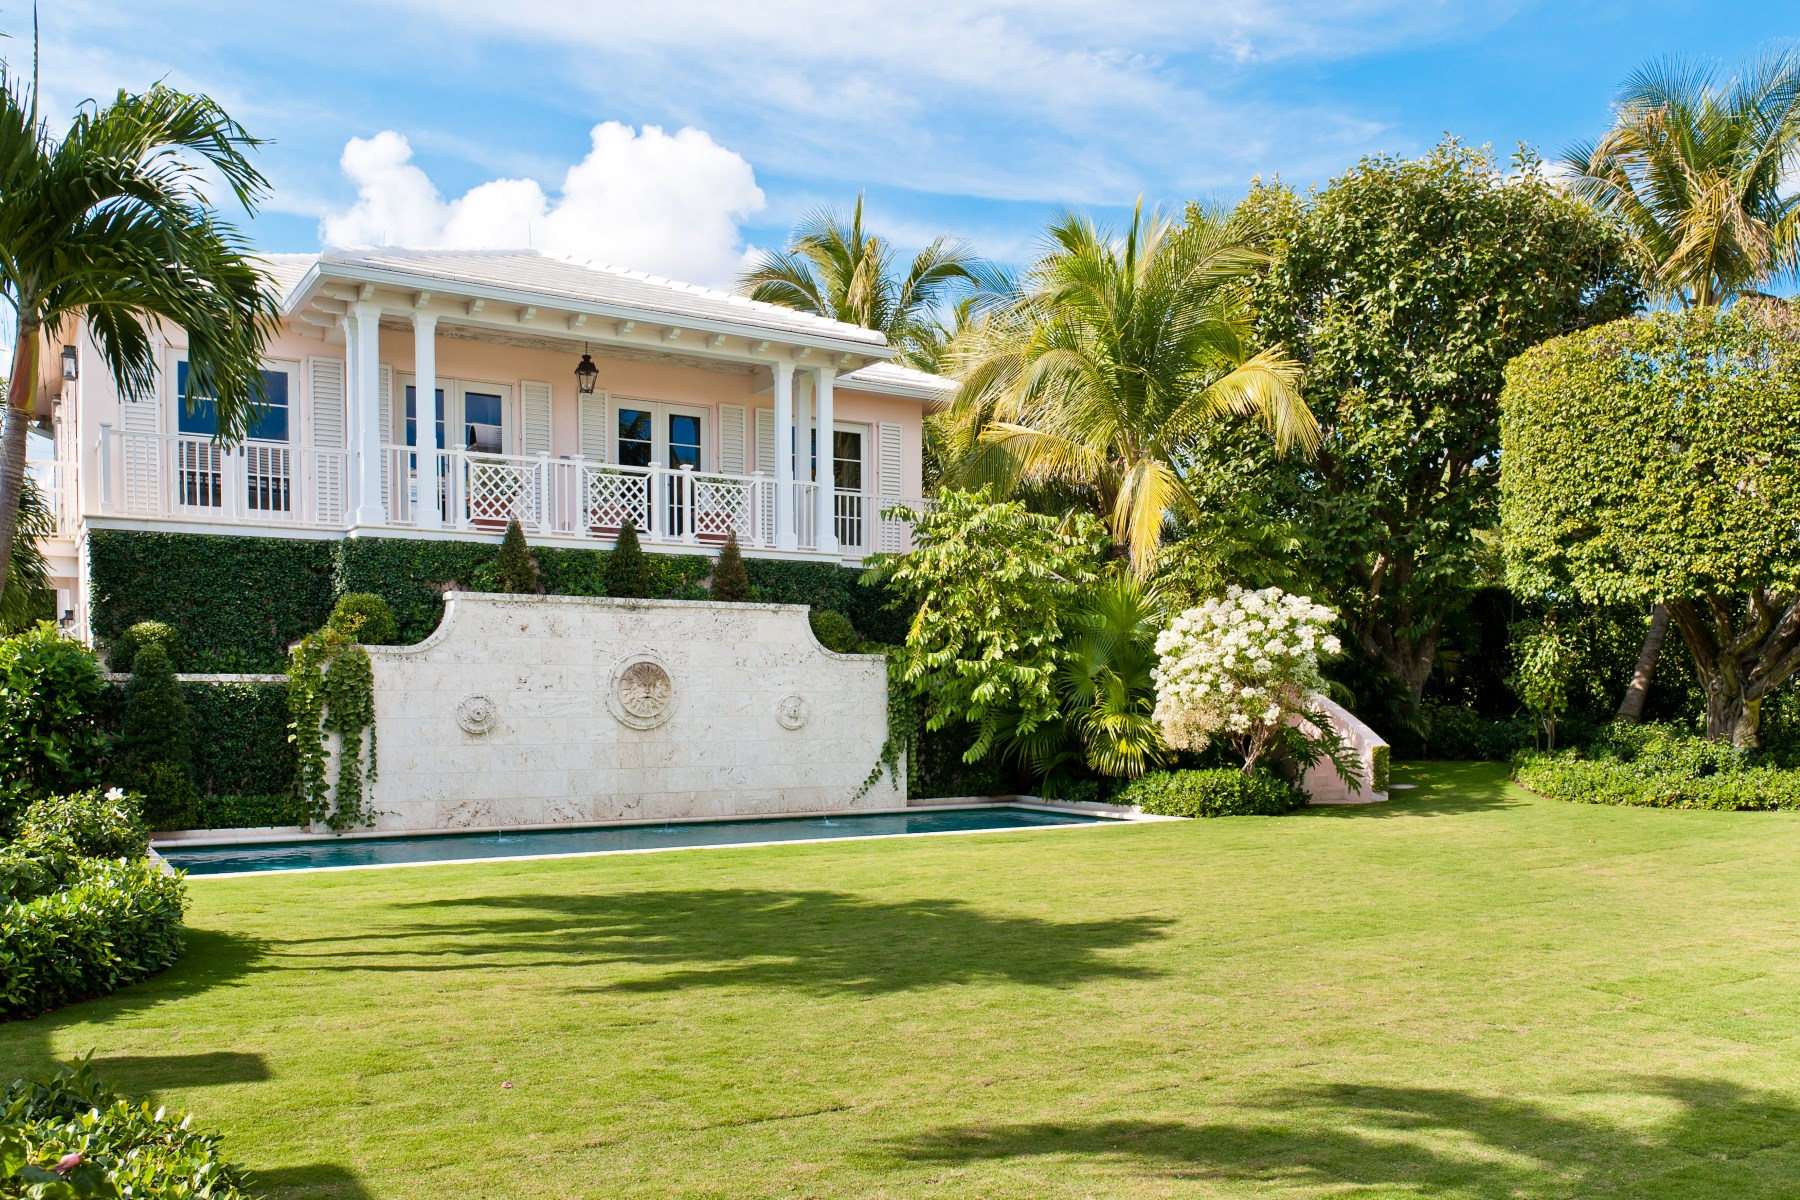 rentals property at Bahama Lane Seasonal Rental